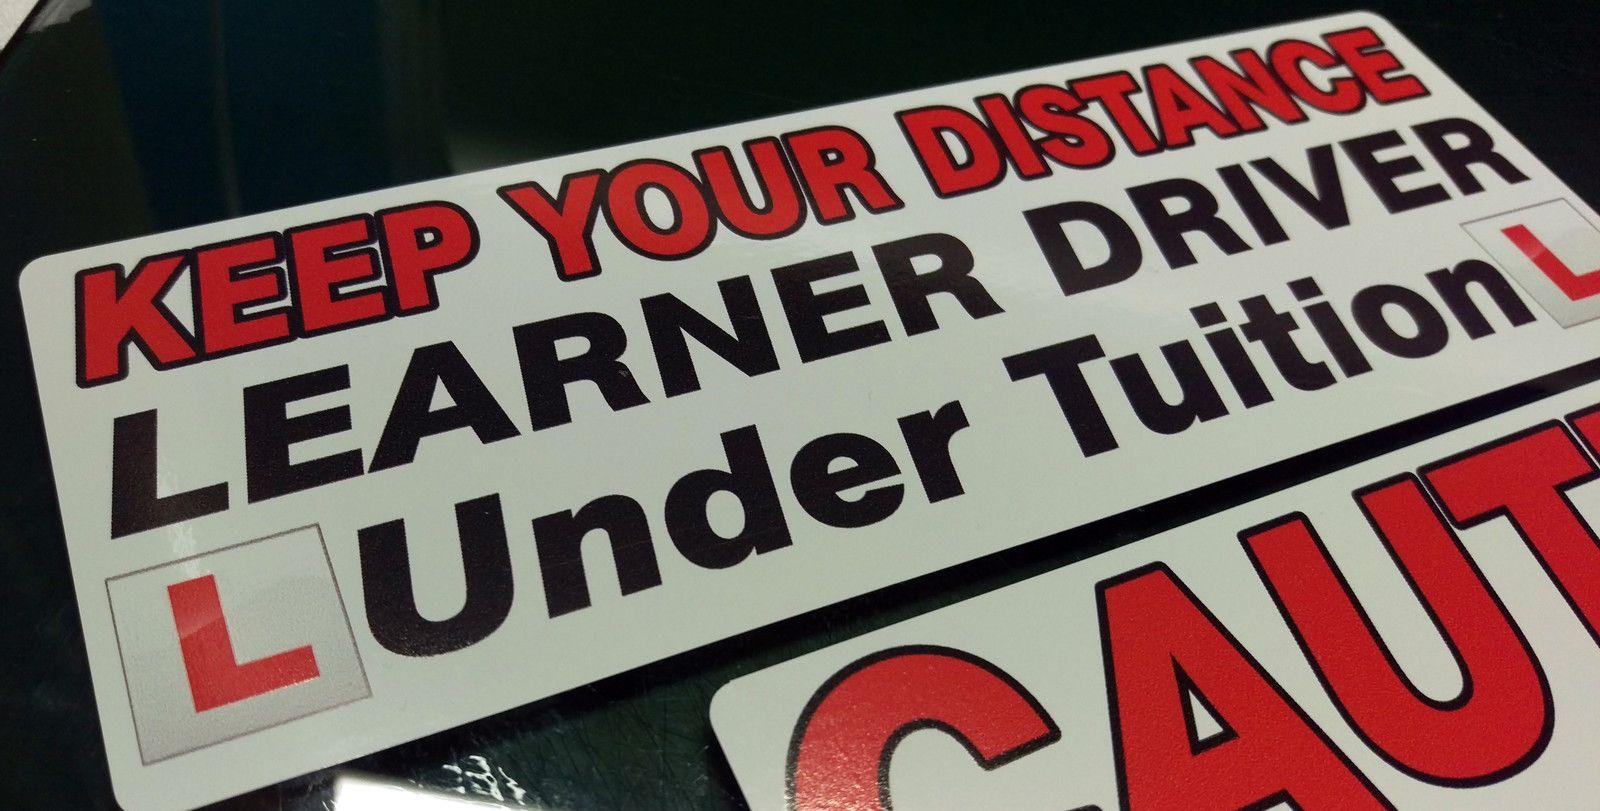 learner driver instrcutor car sticker decal 6 piece set